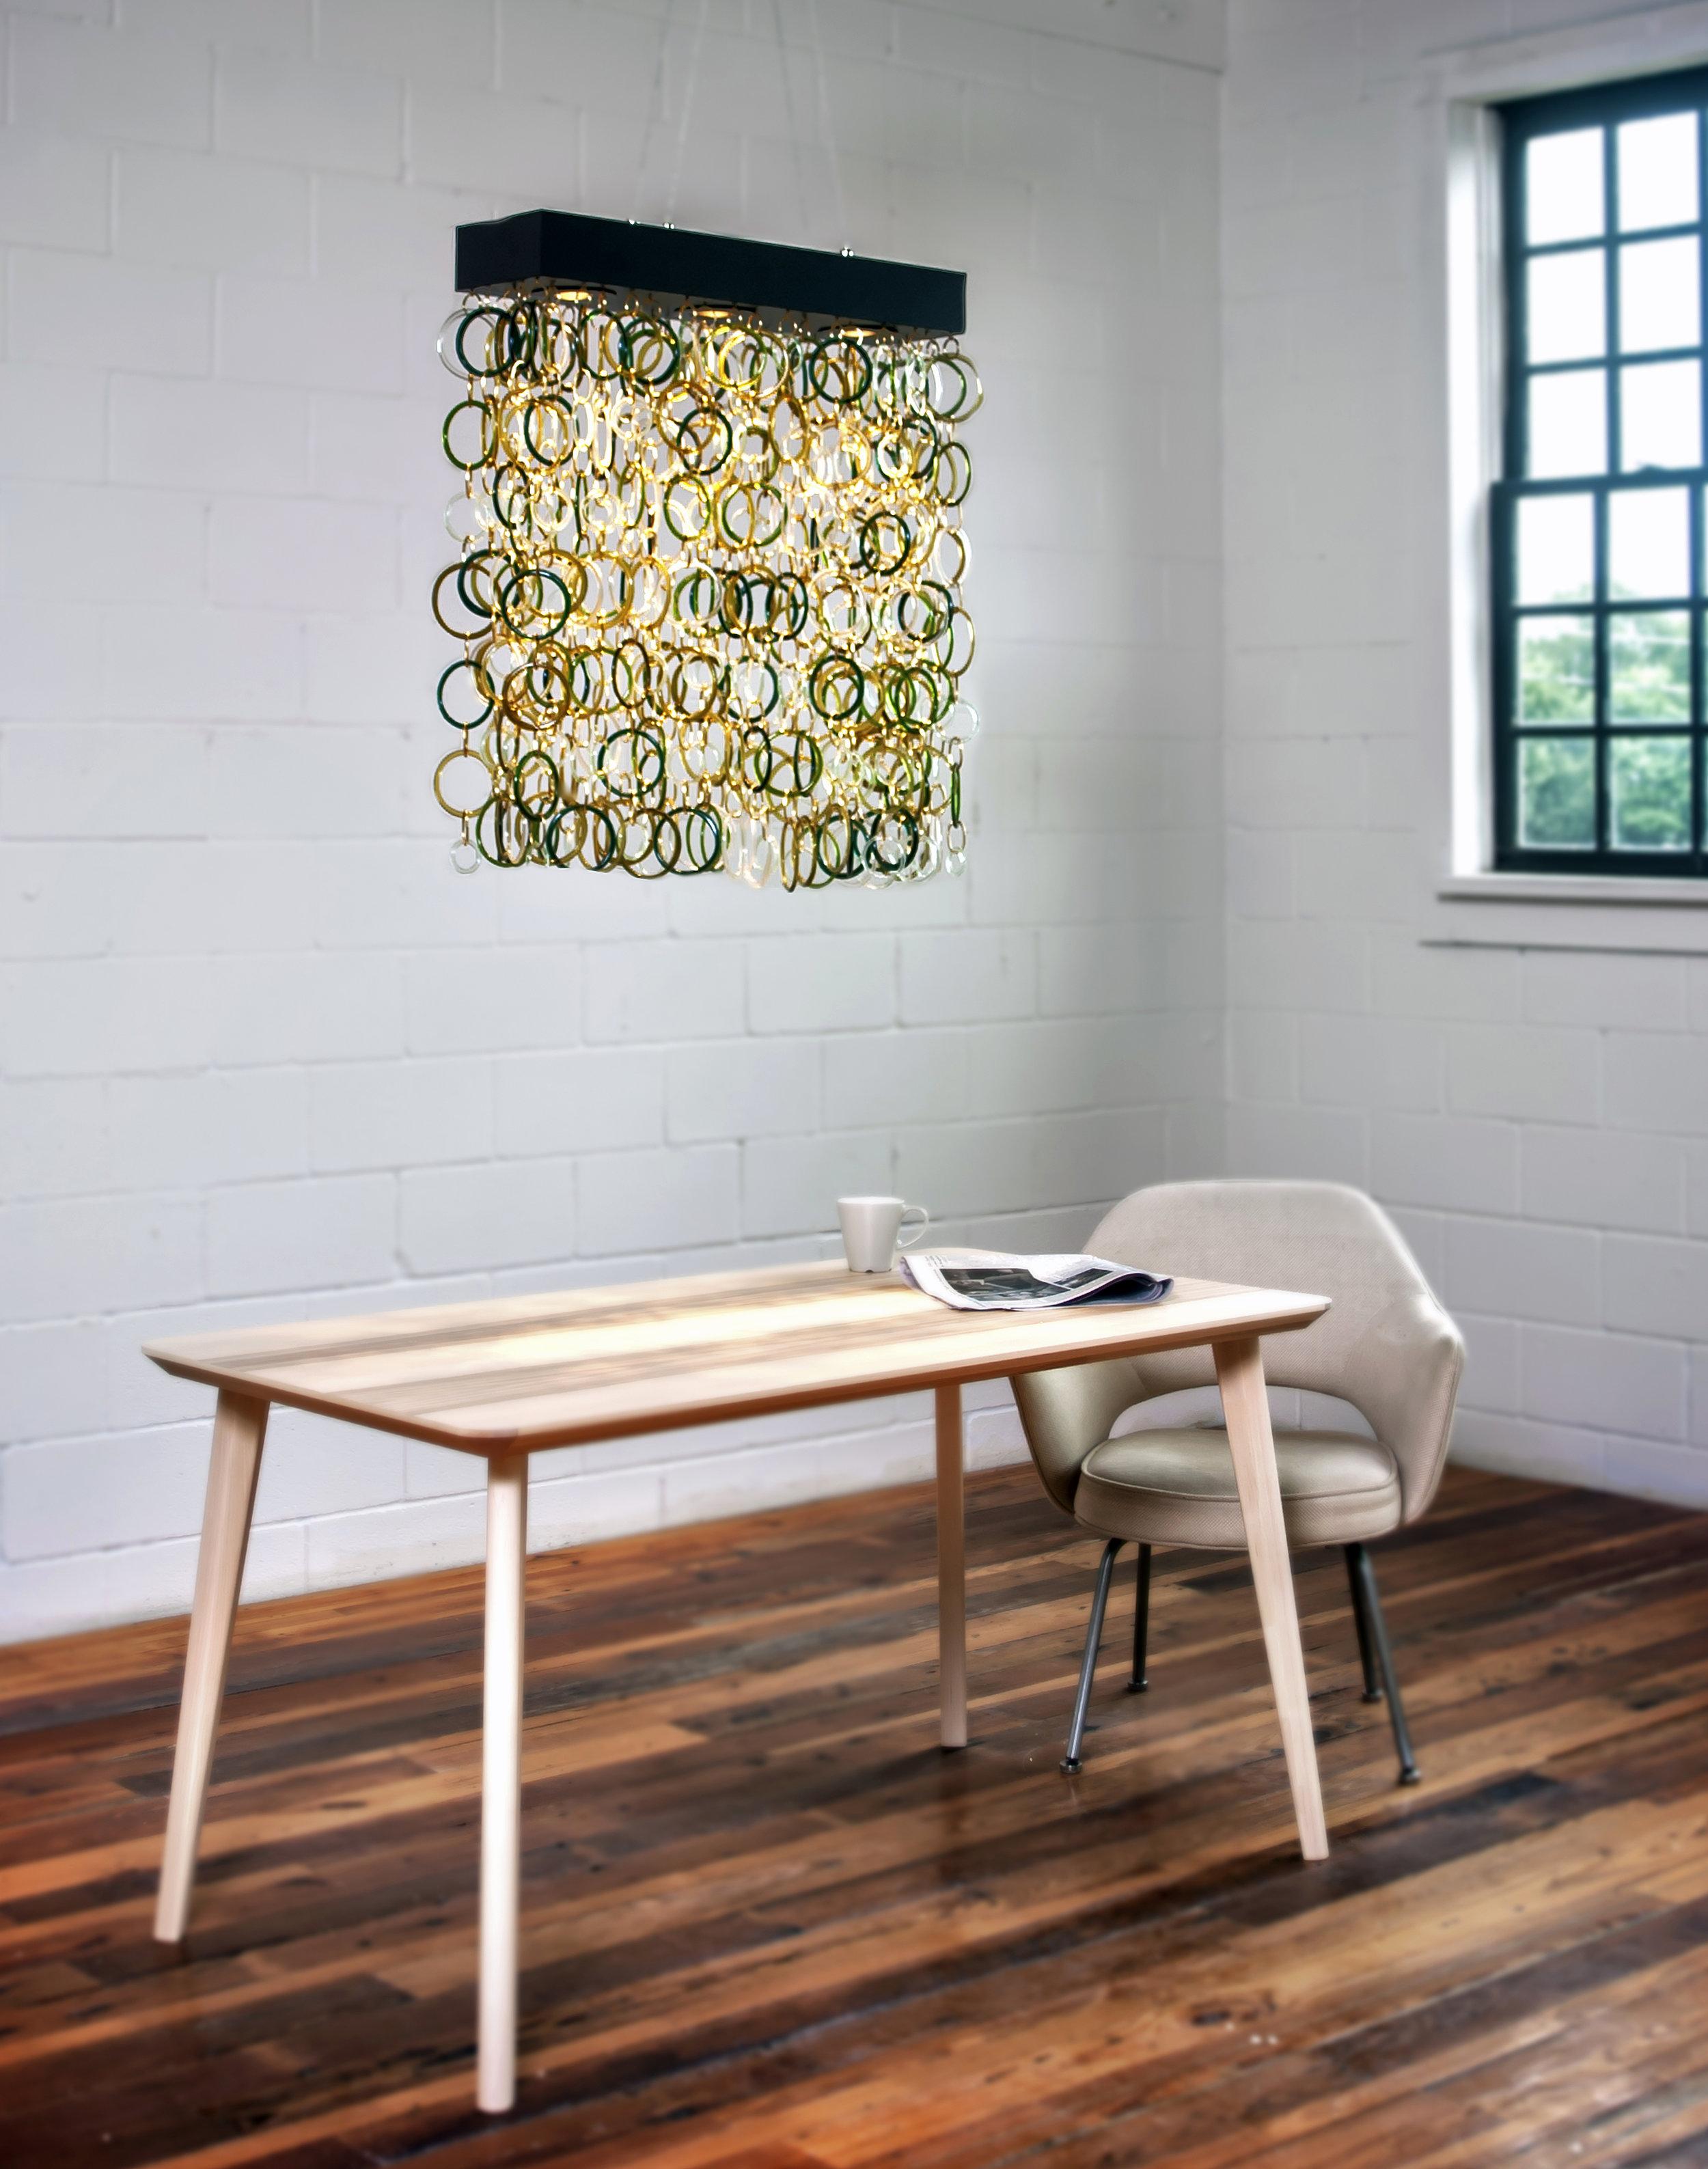 Pictured: Full density,2-foot glass drop, 2-foot dark bronze canopy, wine mix glass.